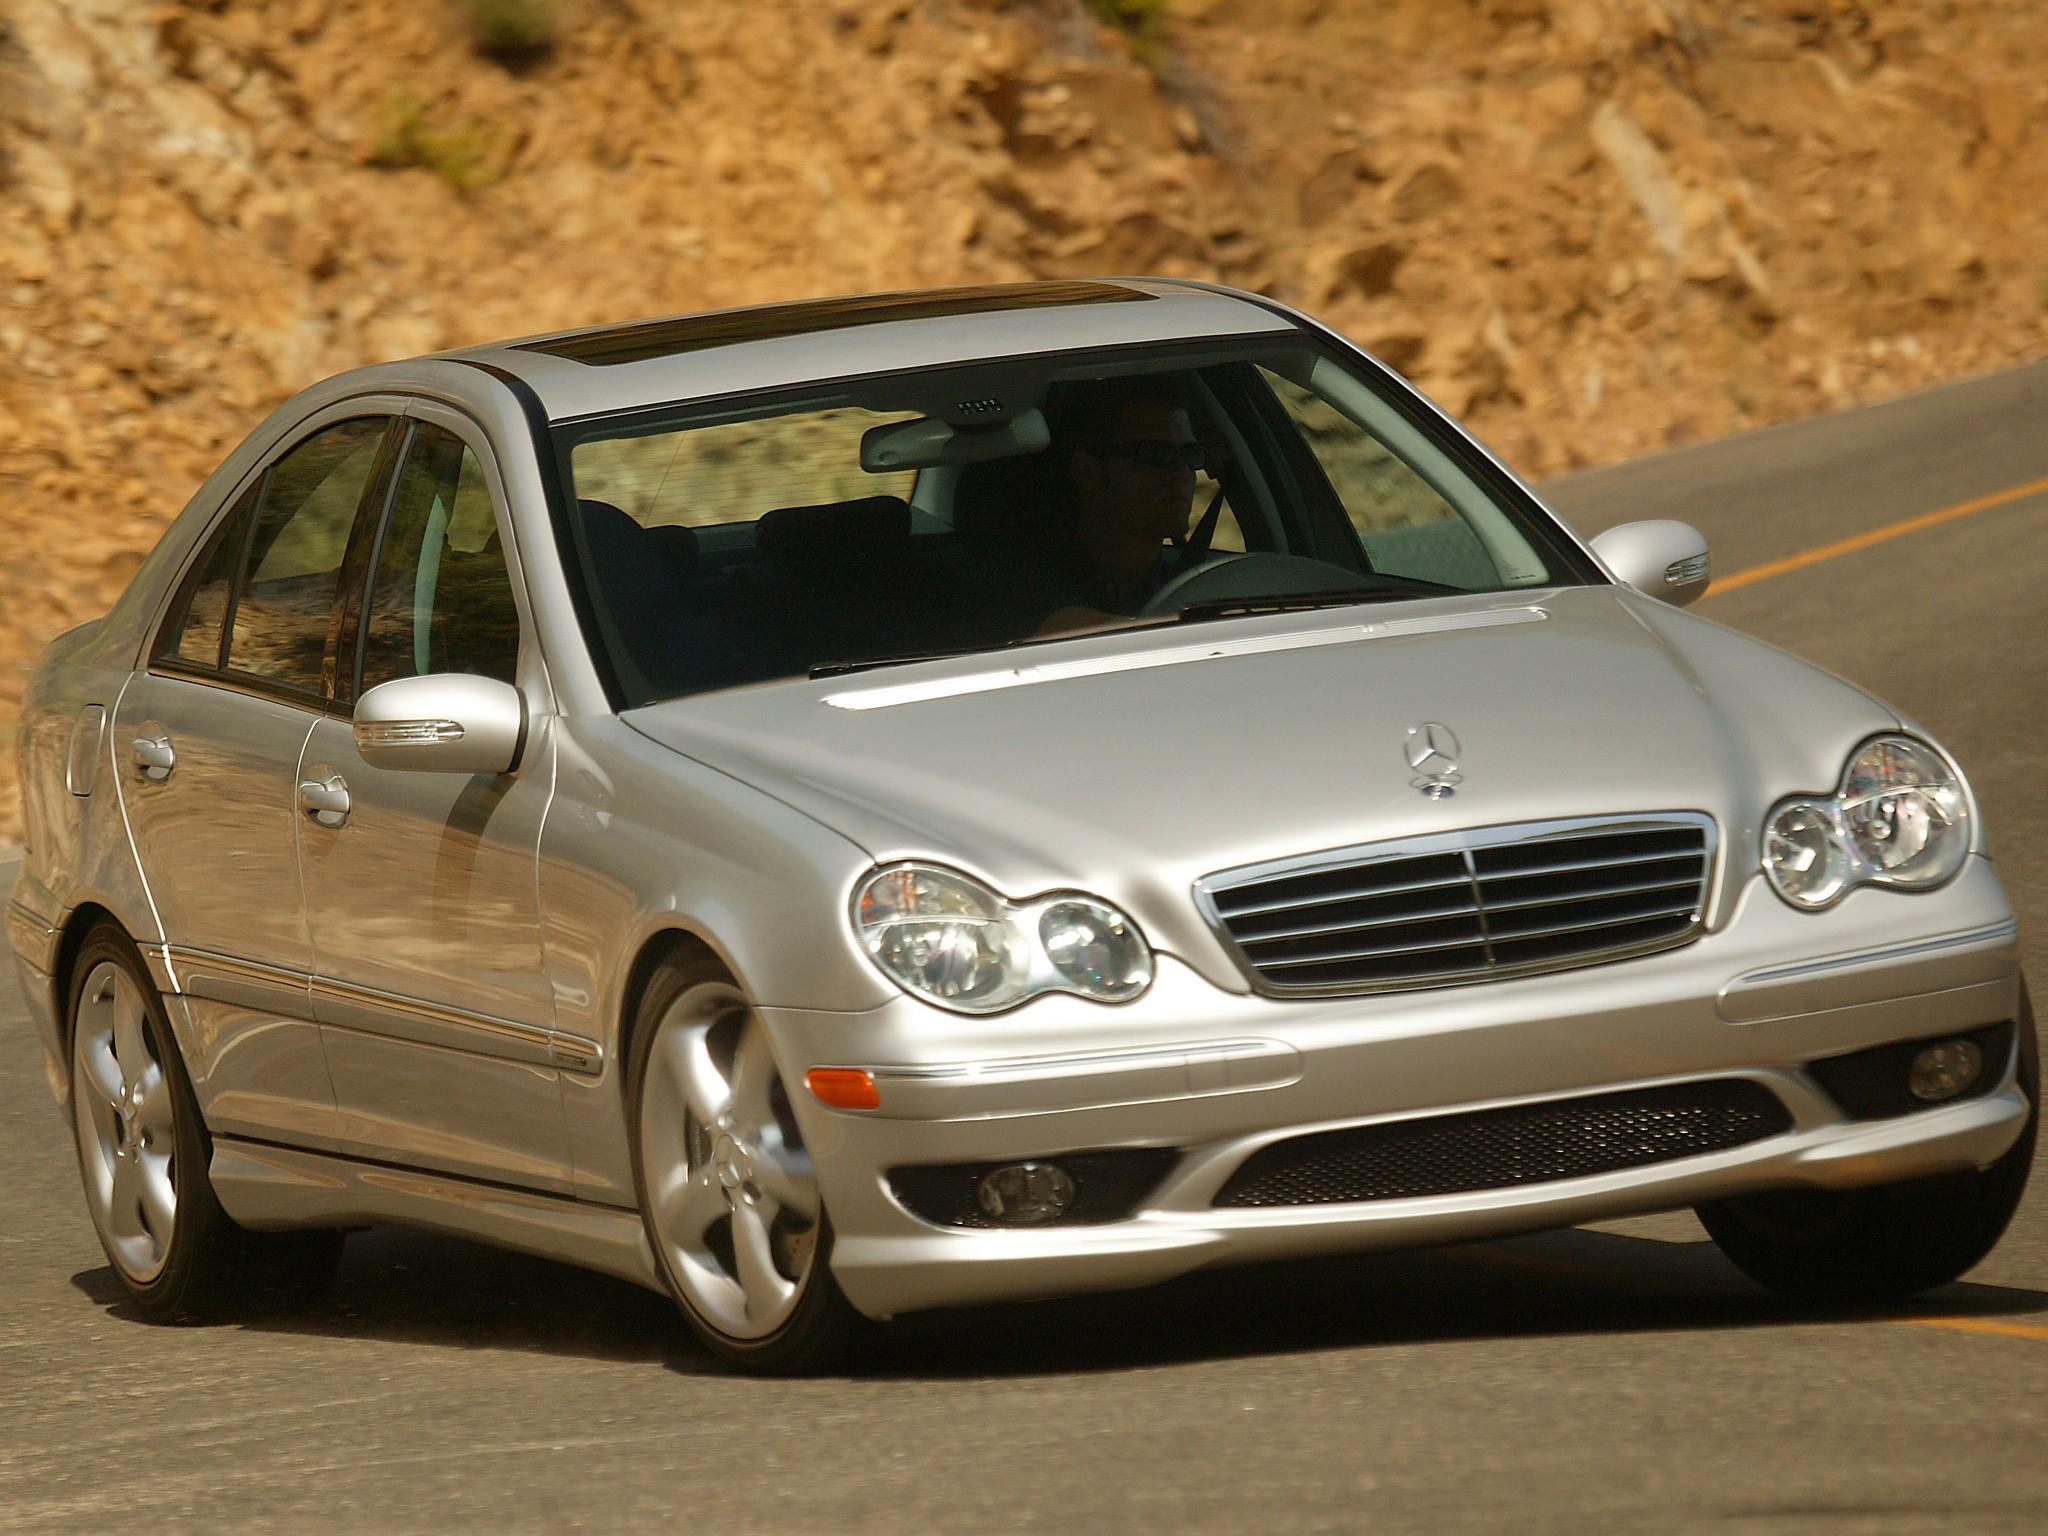 Mercedes Benz W203 Tyyppiviat